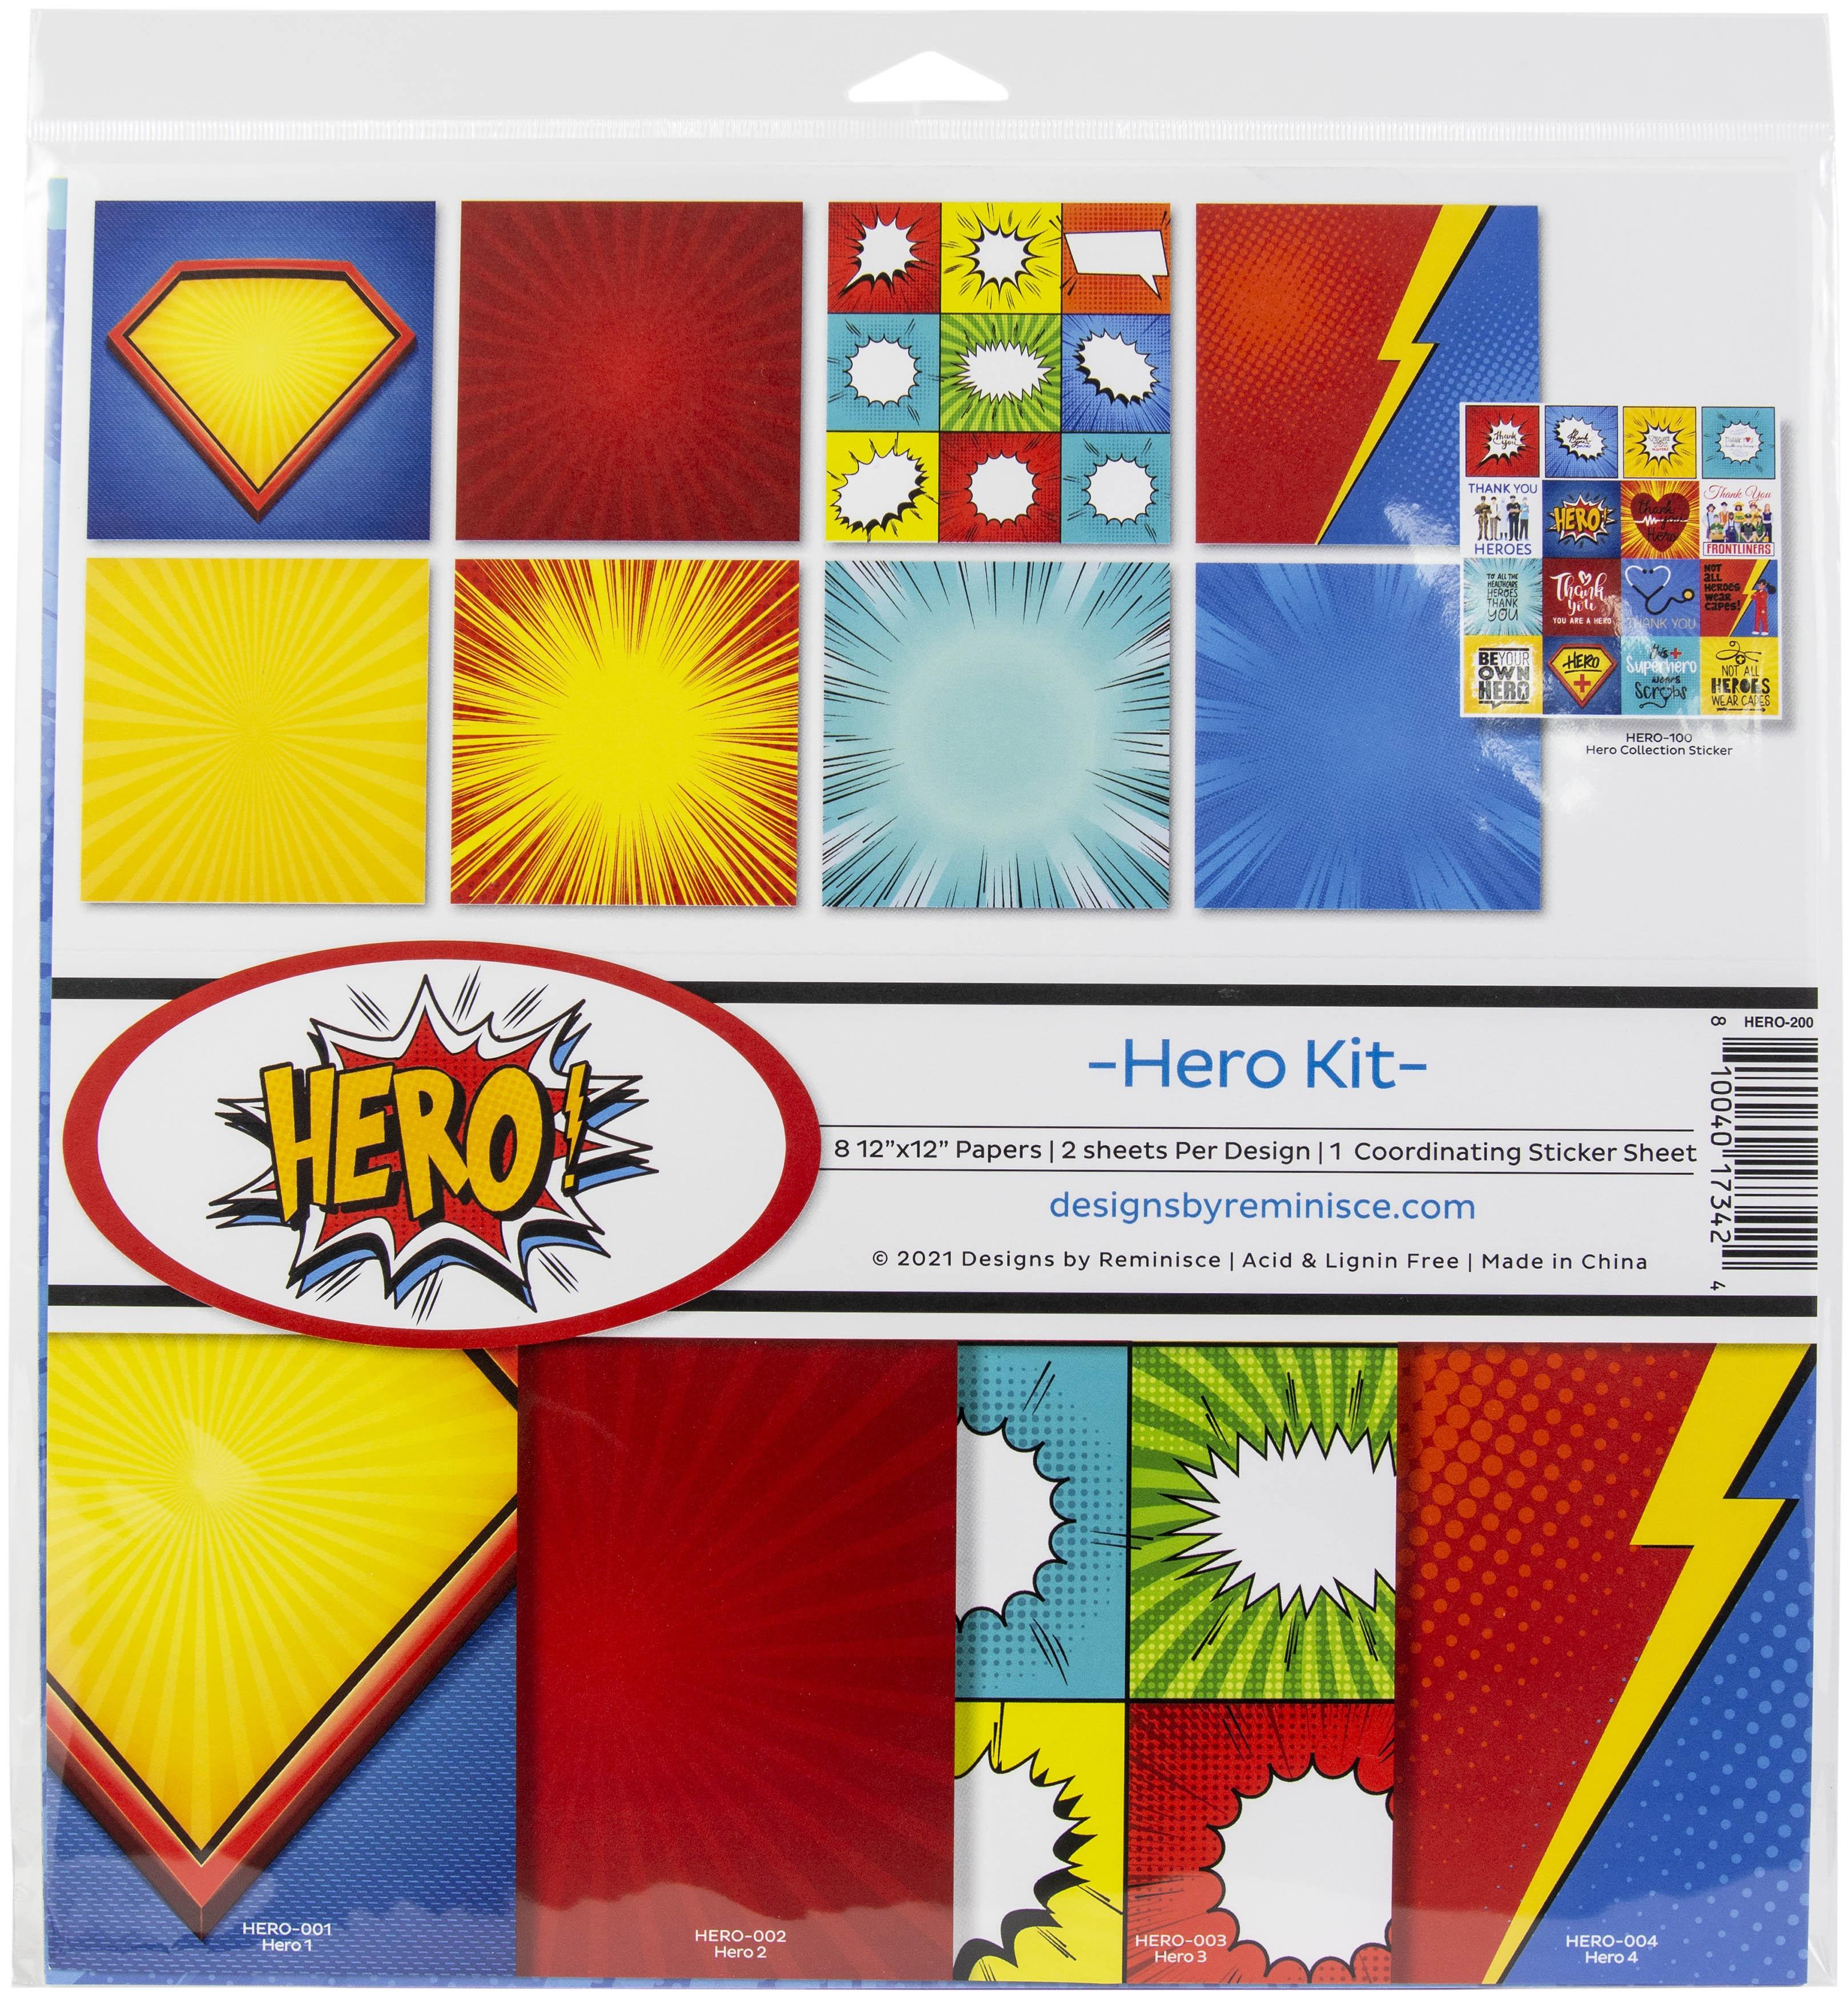 Reminisce Collection Kit 12X12-Hero